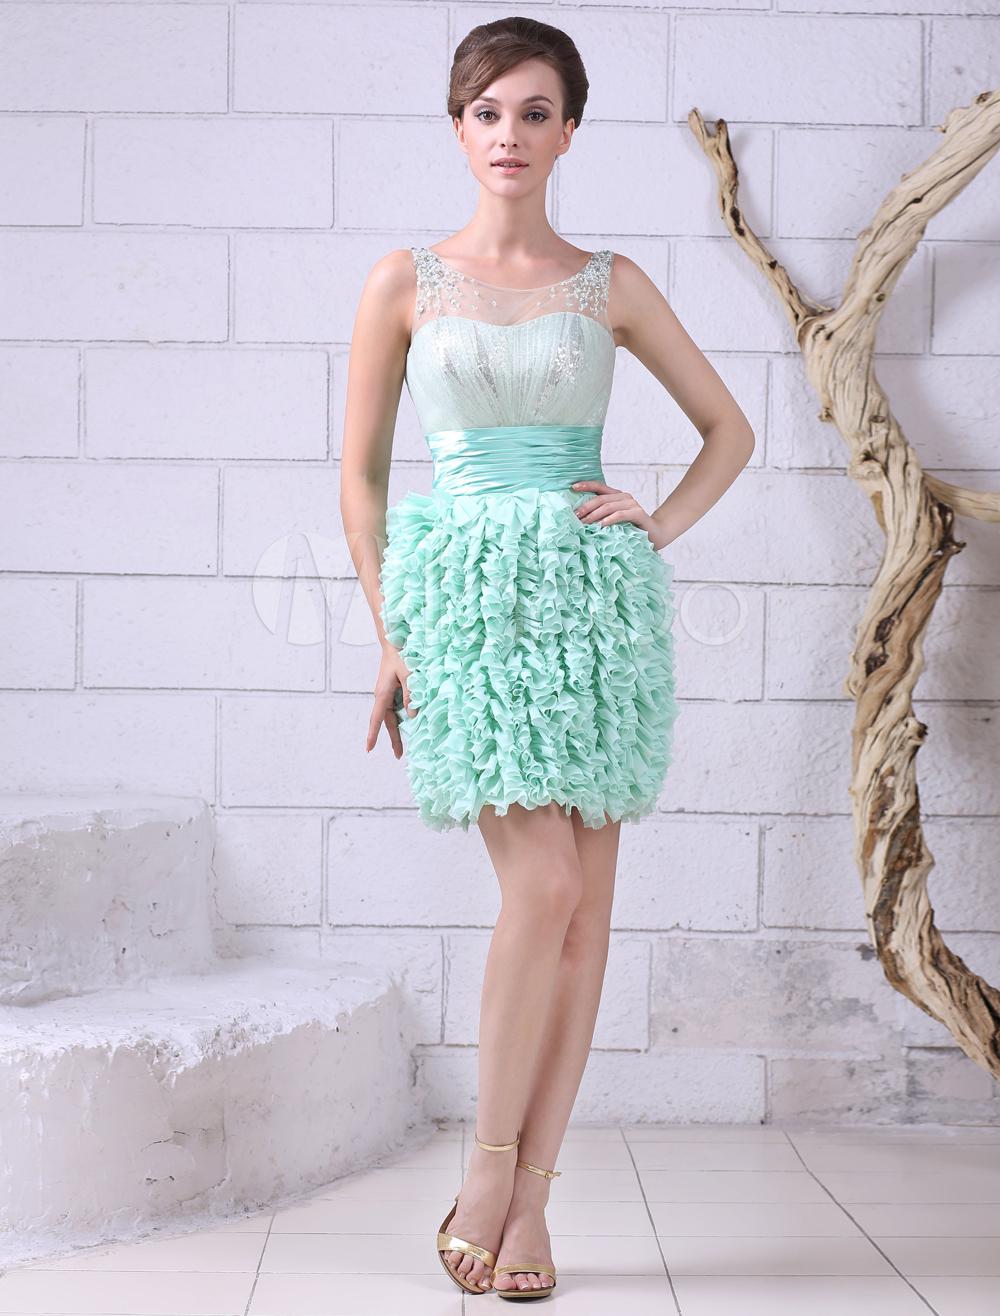 Vestidos De Baño Verde Menta:Mint Green Chiffon Cocktail Dress